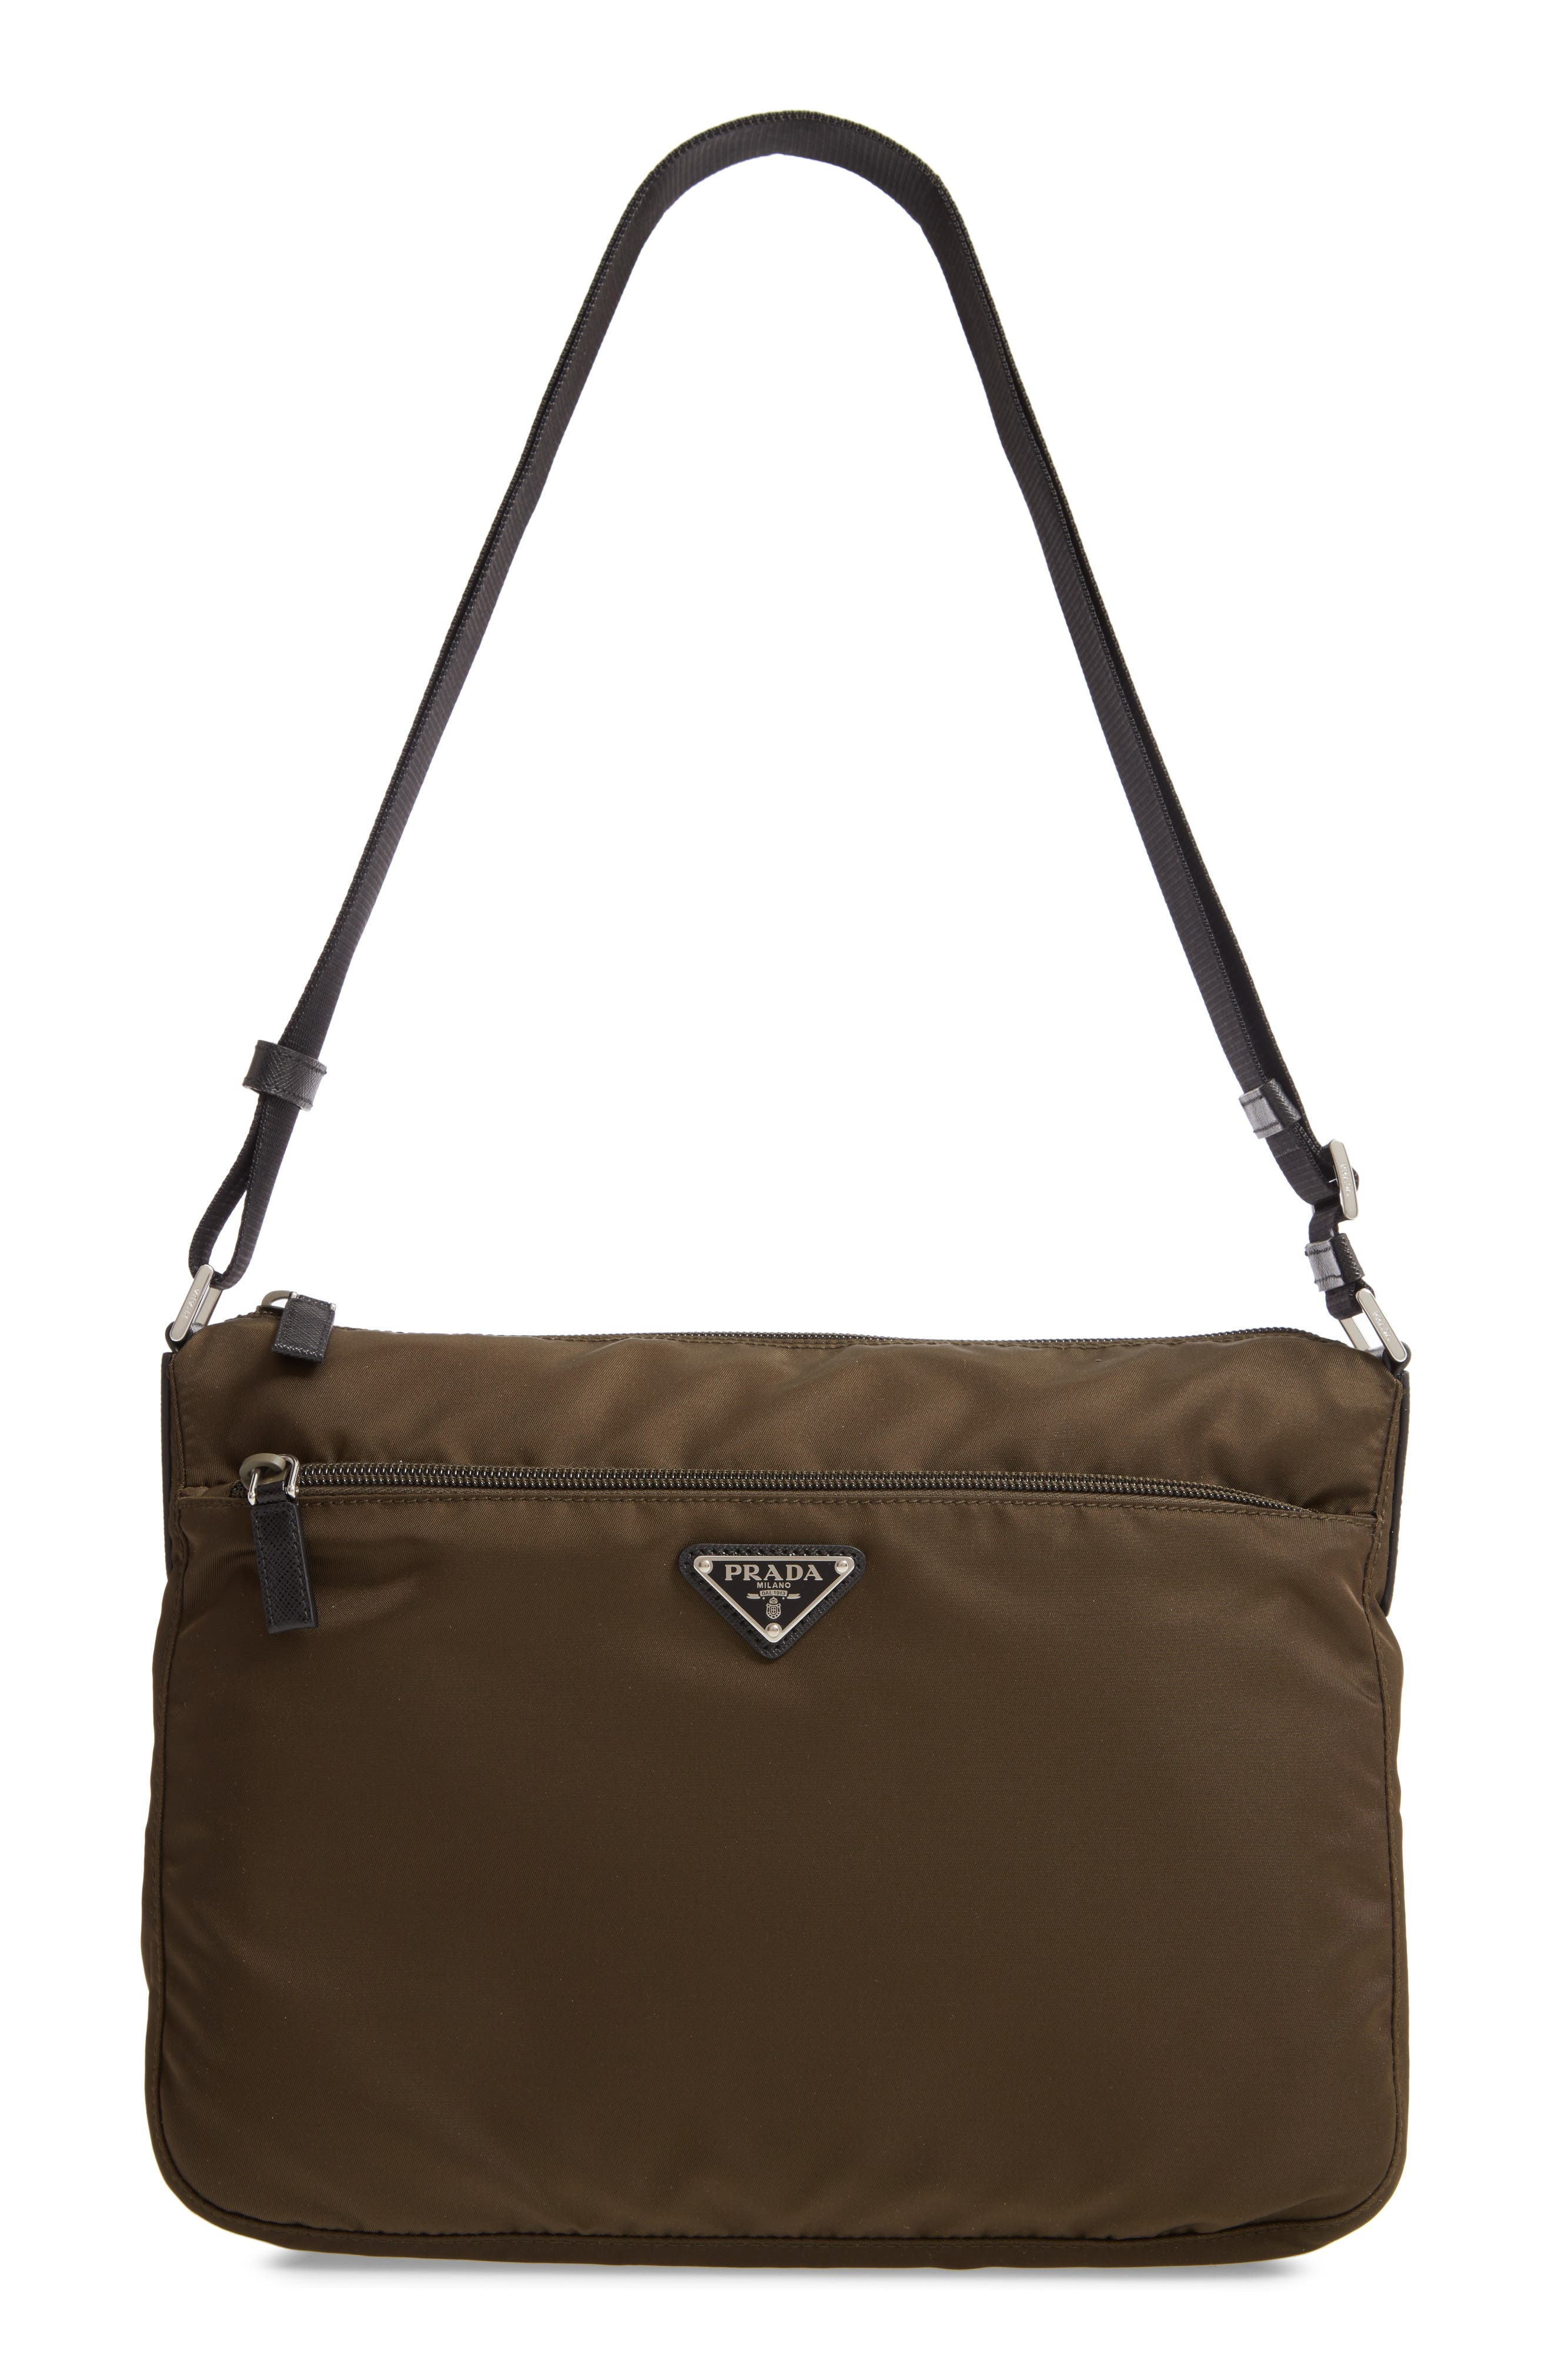 685454cb13 Prada Crossbody Bags | Nordstrom